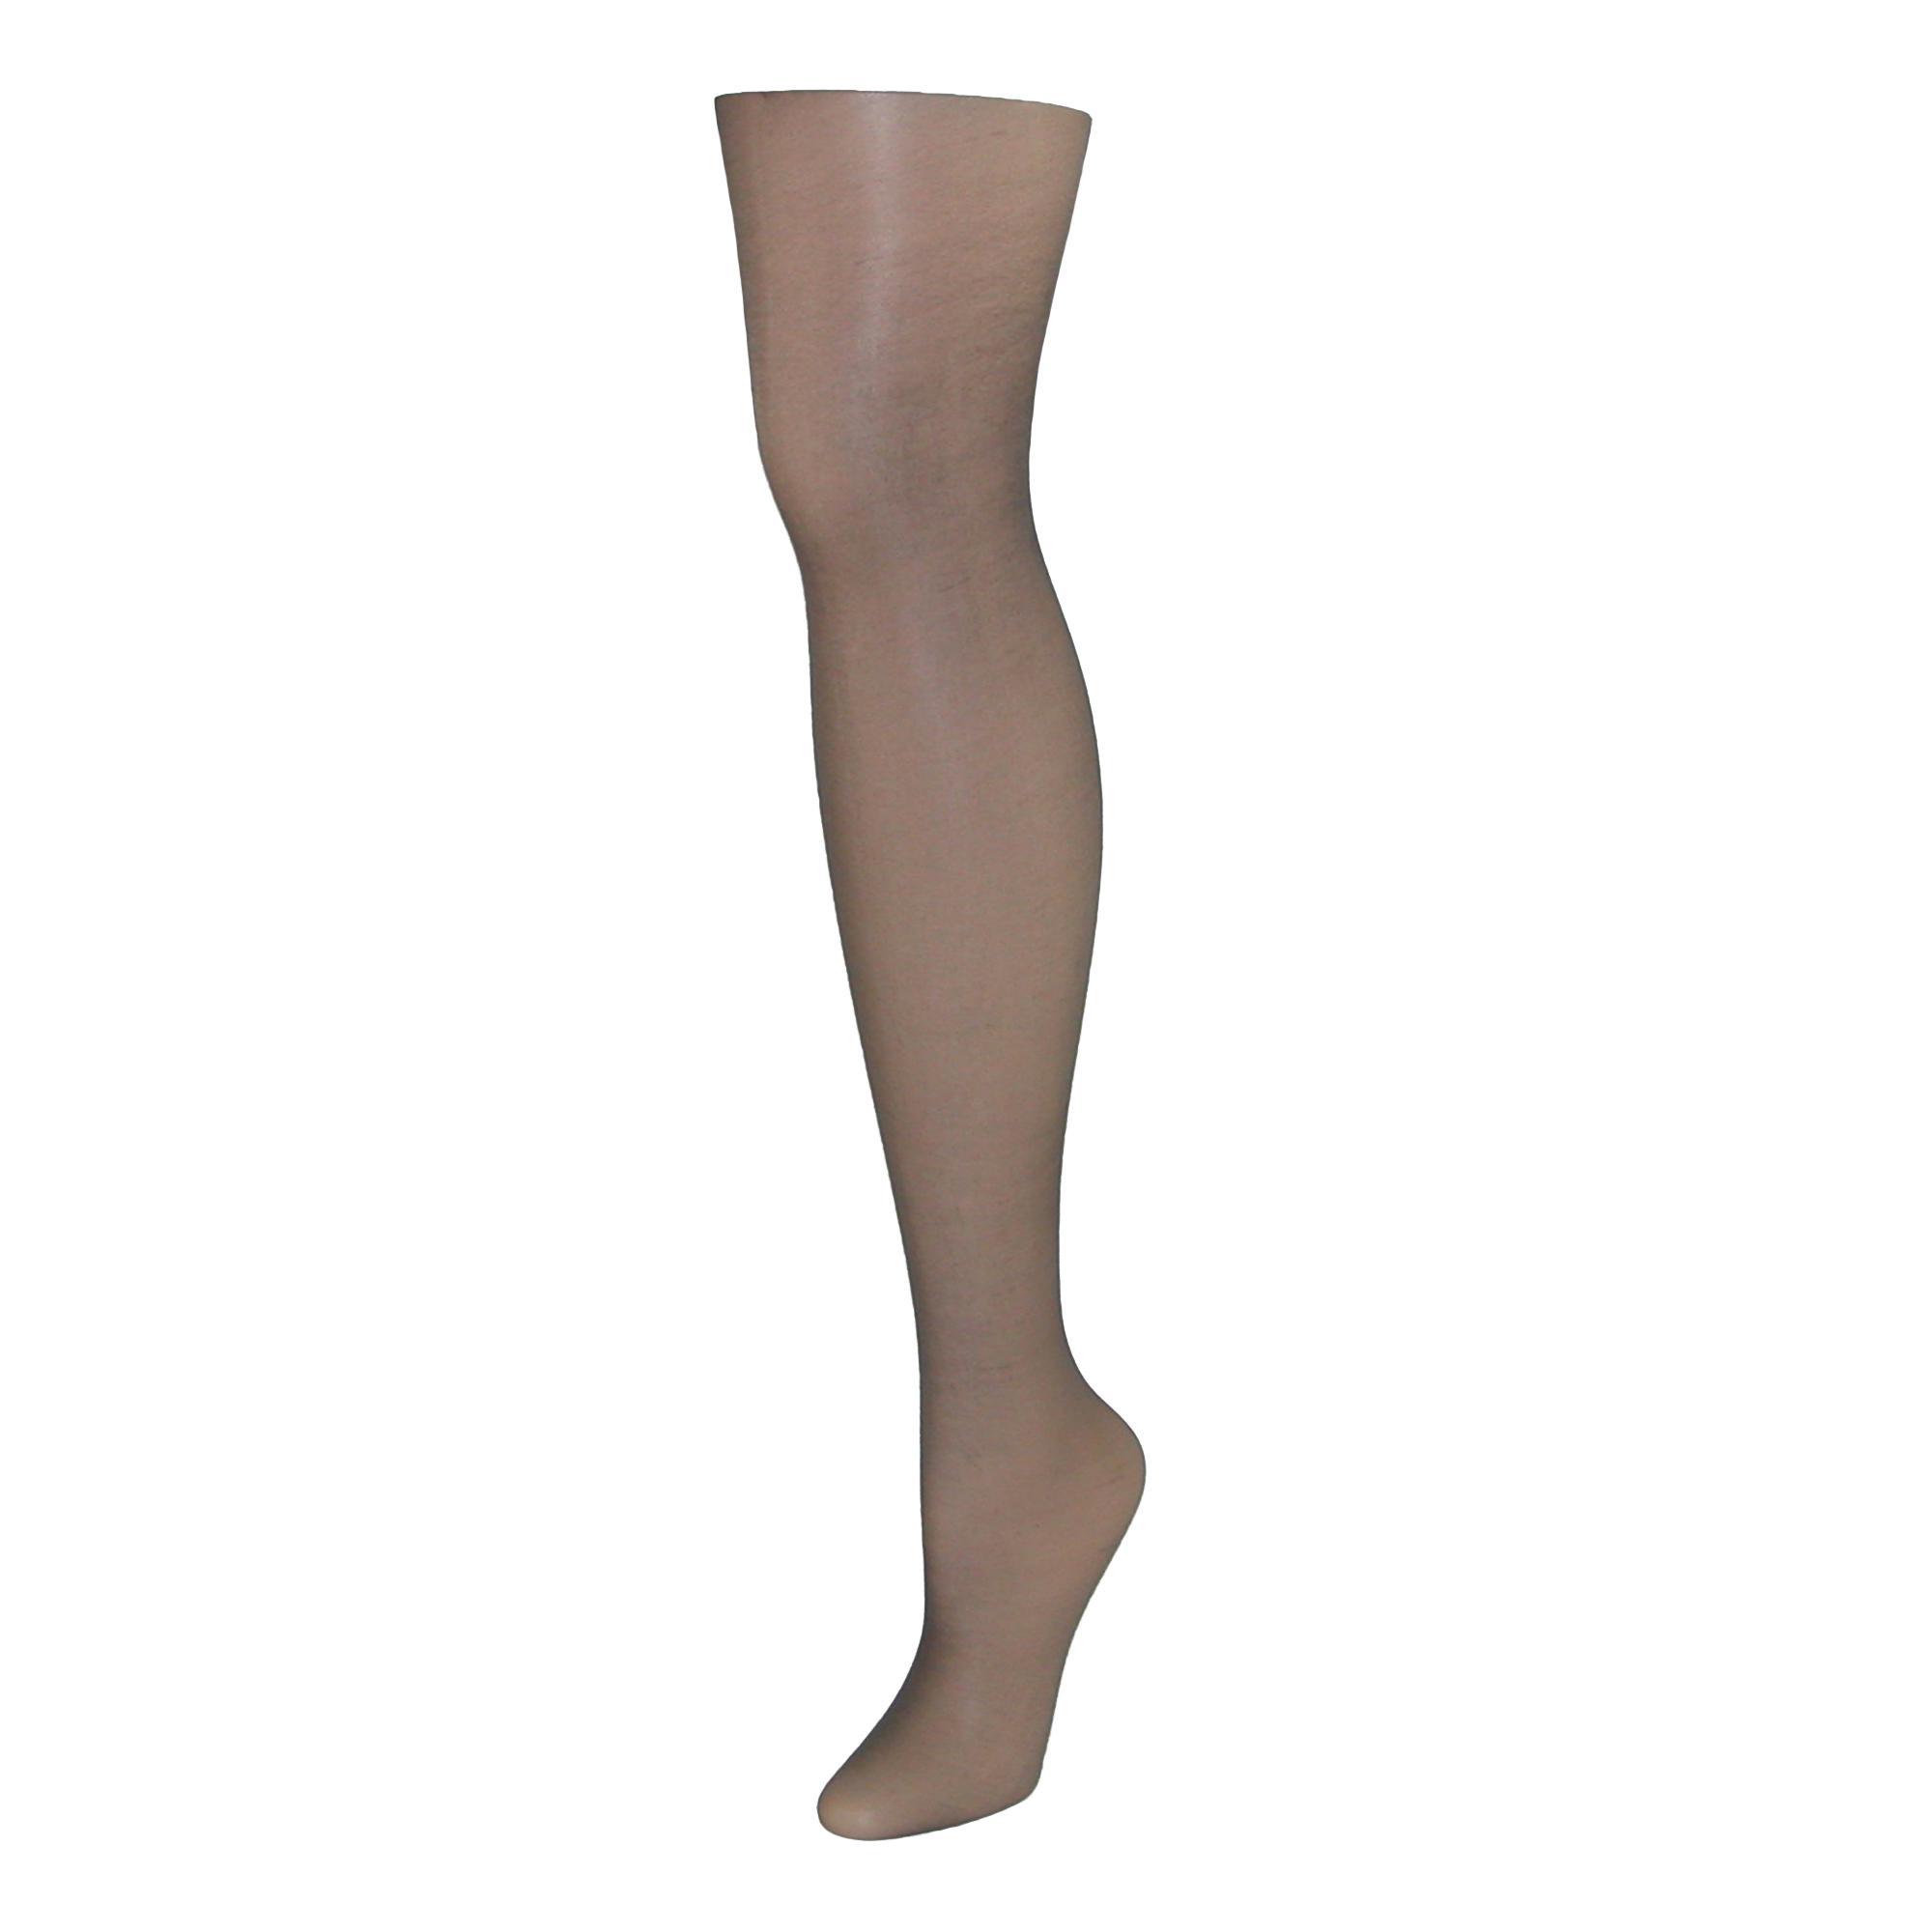 f4b0faf655866 Leggs Women's Nylon Run Resistant Sheer Control Top Pantyhose - Misty